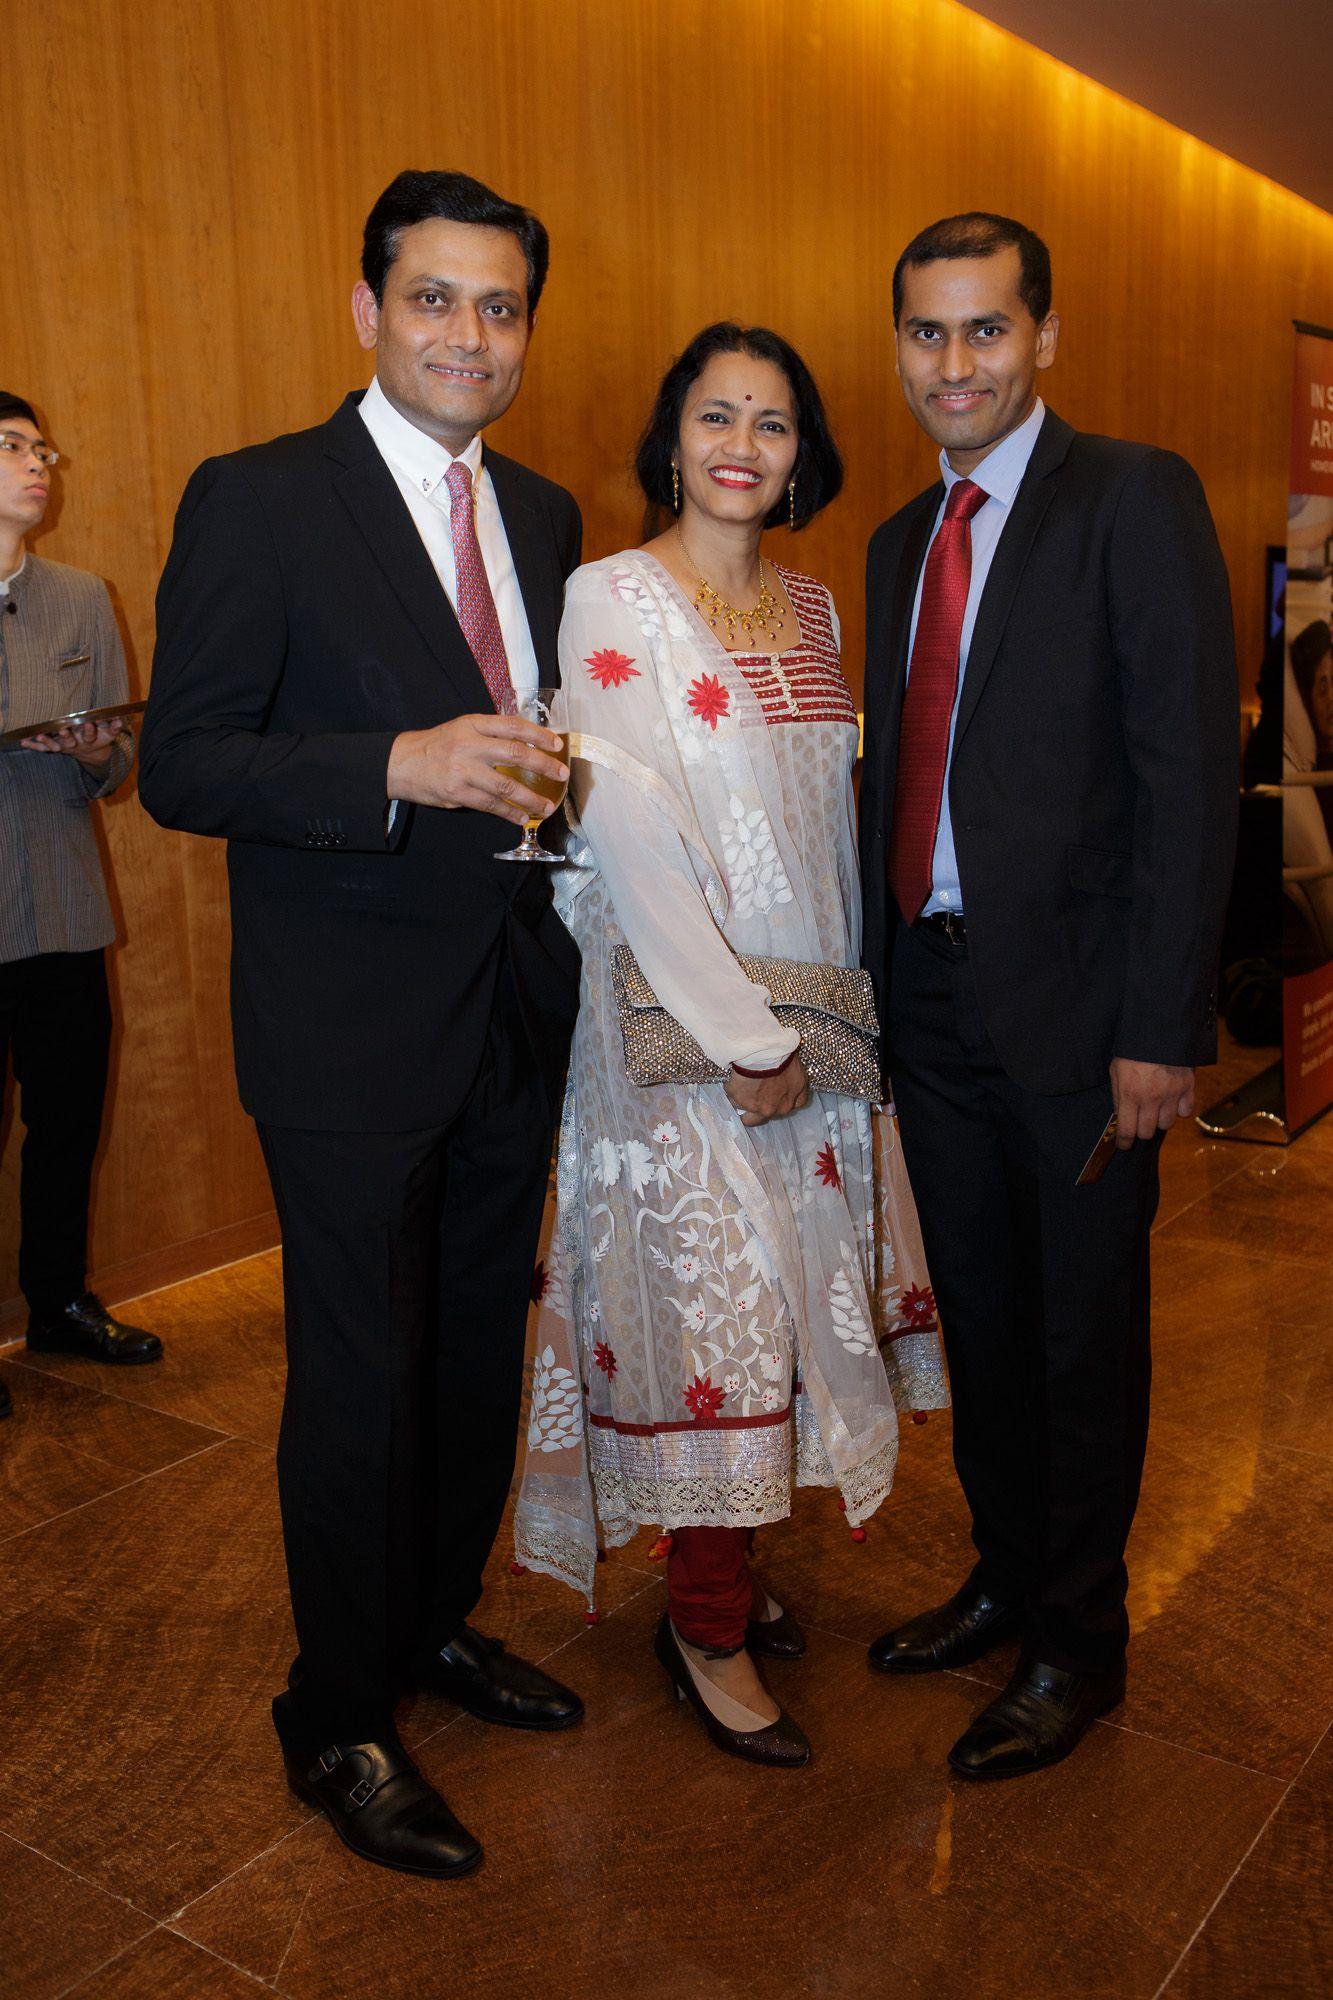 Sanjoy Sen, Supriya Sen, Nikhil Sen